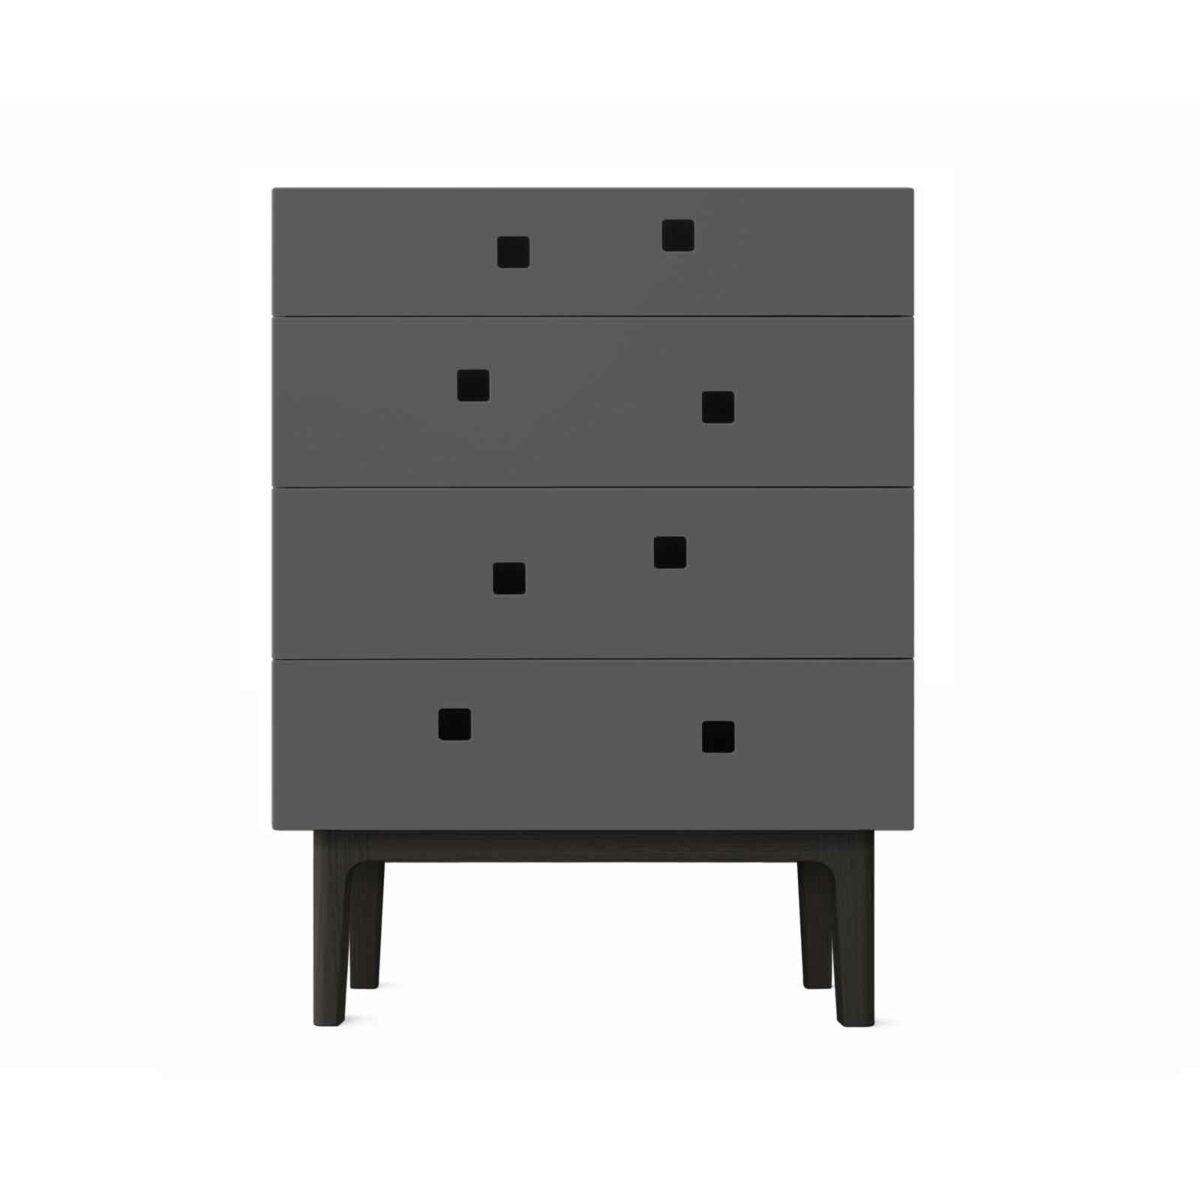 PEEP B3 grey blackbase